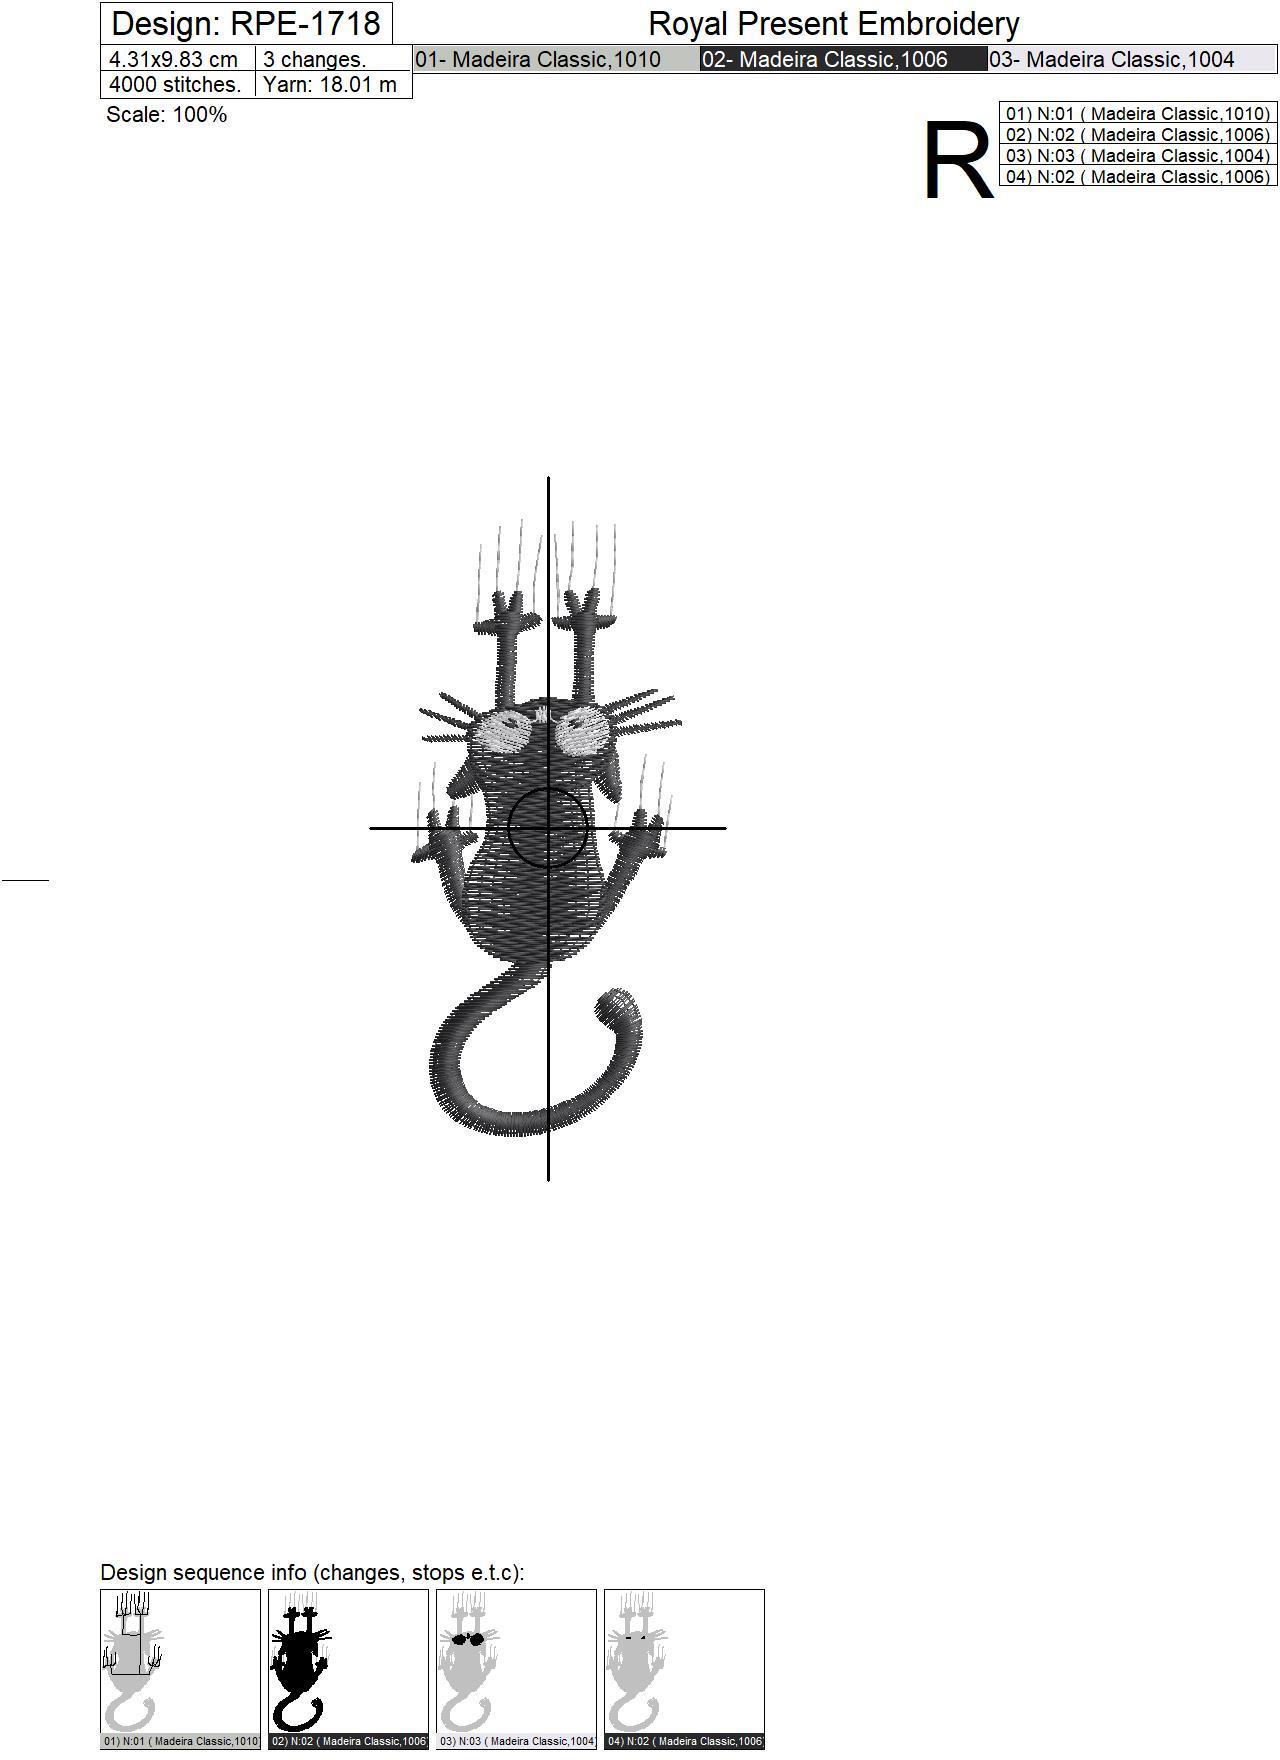 Black Сat Machine Embroidery Design - 2 sizes